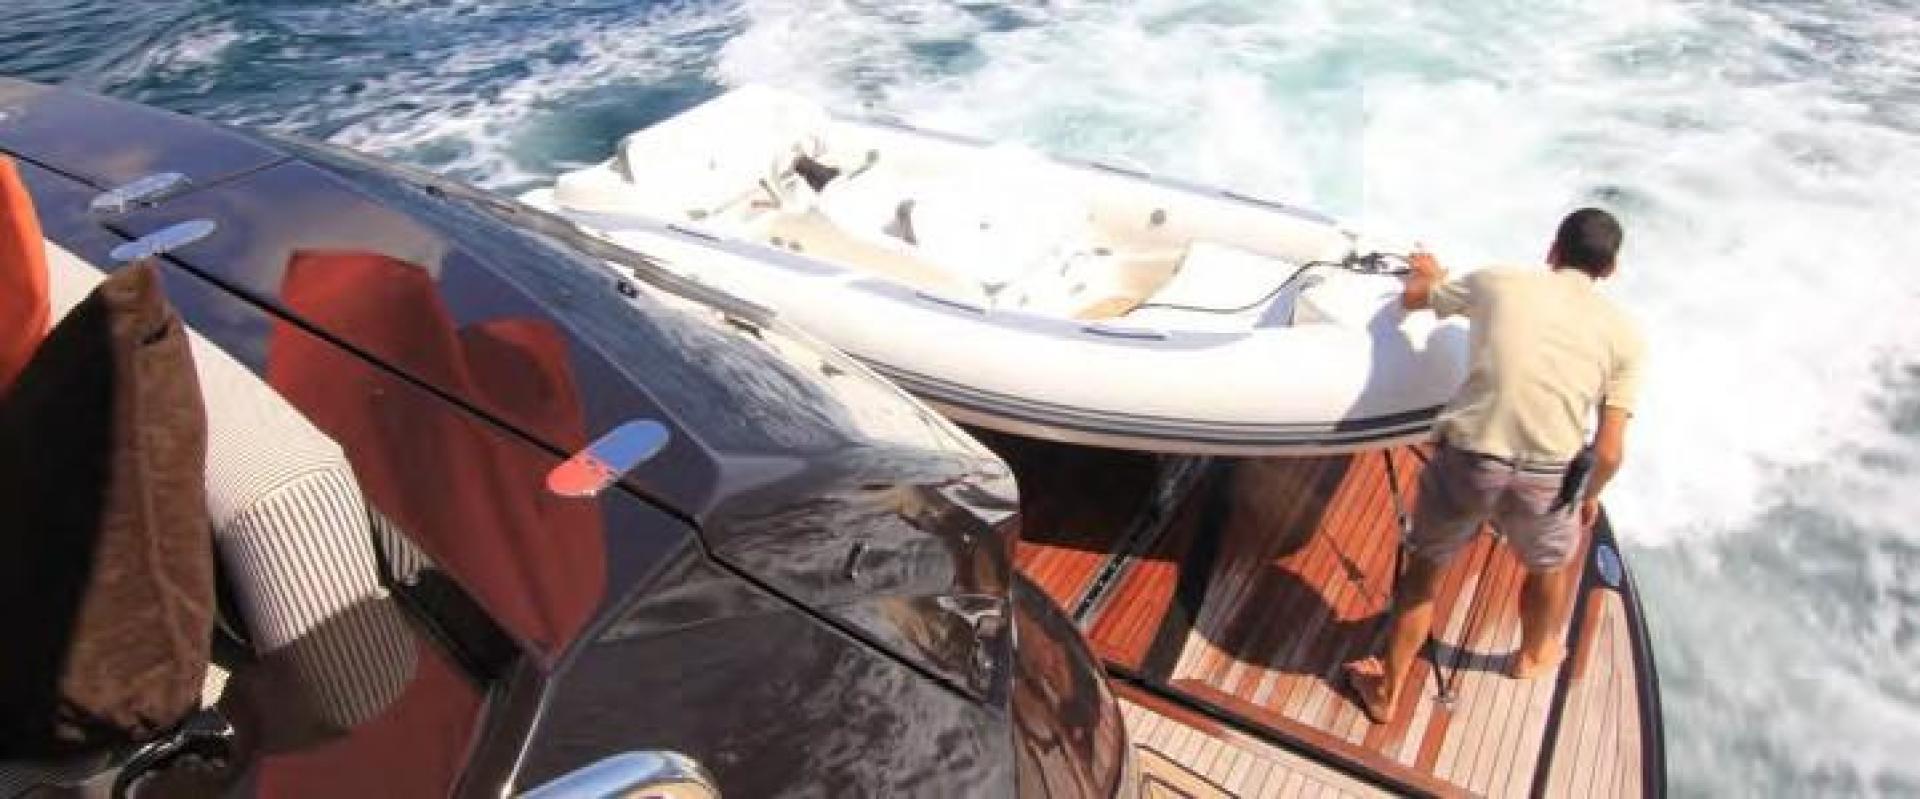 Sunseeker-Flybridge Motoryacht 2009-ANNABEL Mallorca-Spain-Swim Platform-902628 | Thumbnail